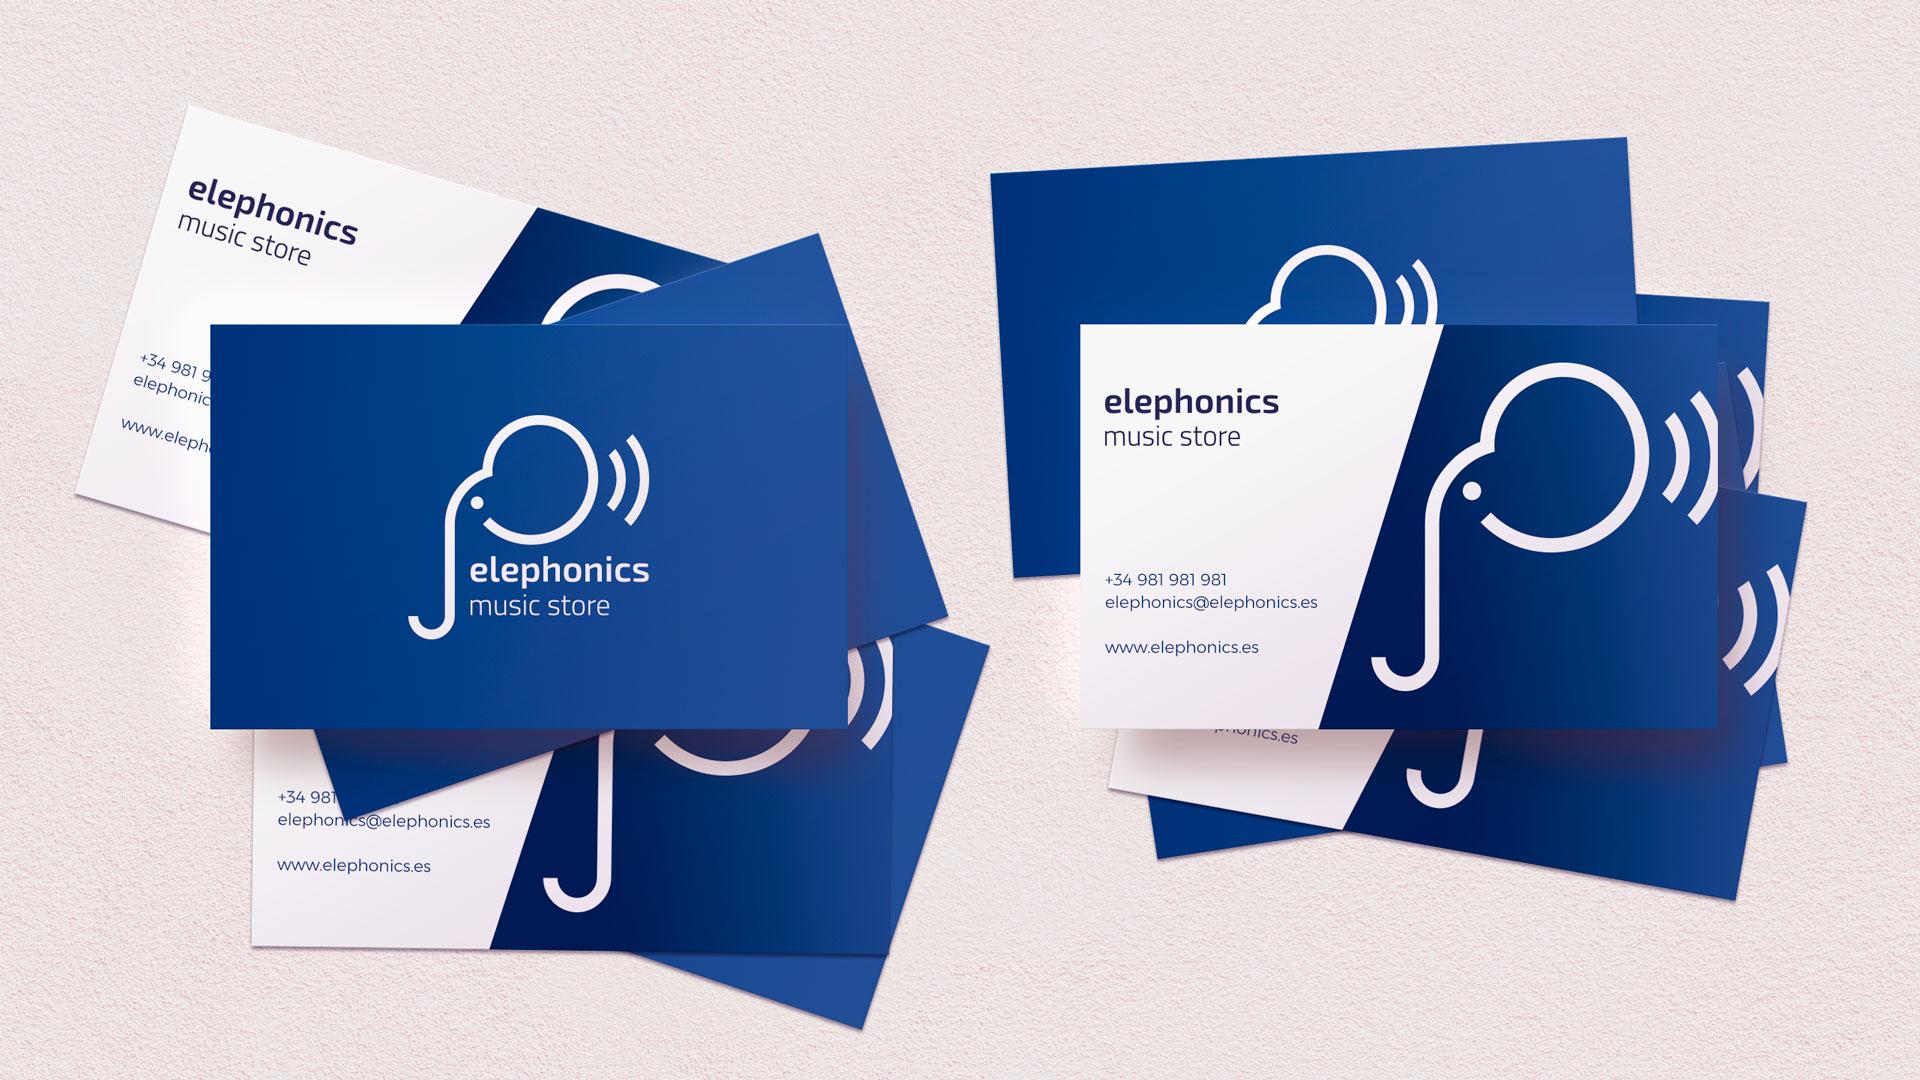 tarjetas-elephonics-v11